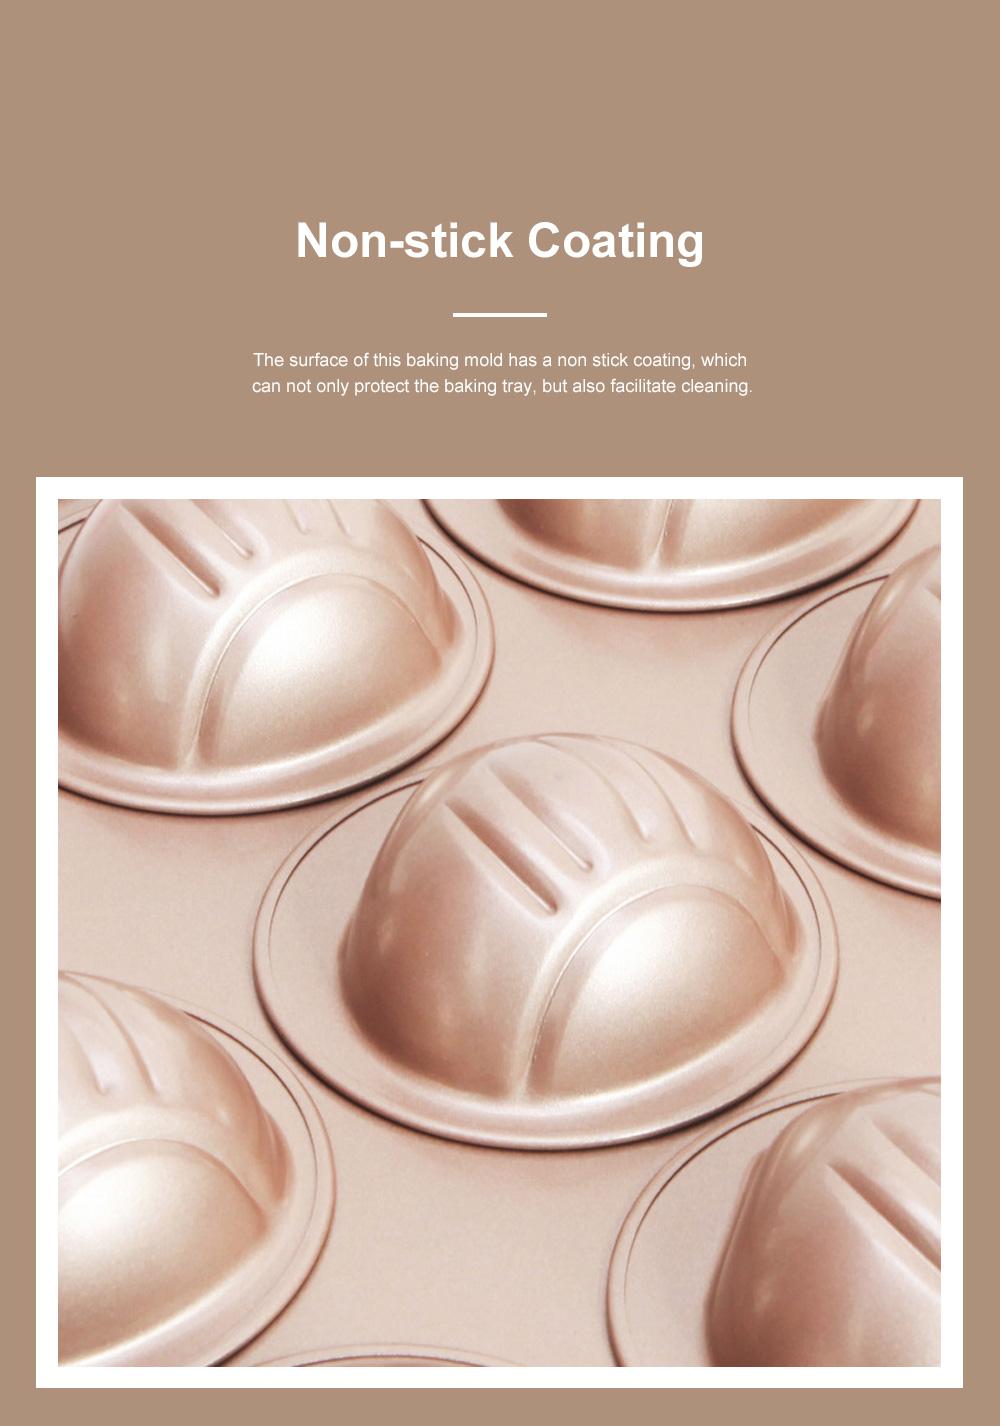 Chefmade 12 Cup Chestnut Cake Mold Non Stick Cake Mold Baking Plate Baking Mold Golden 4